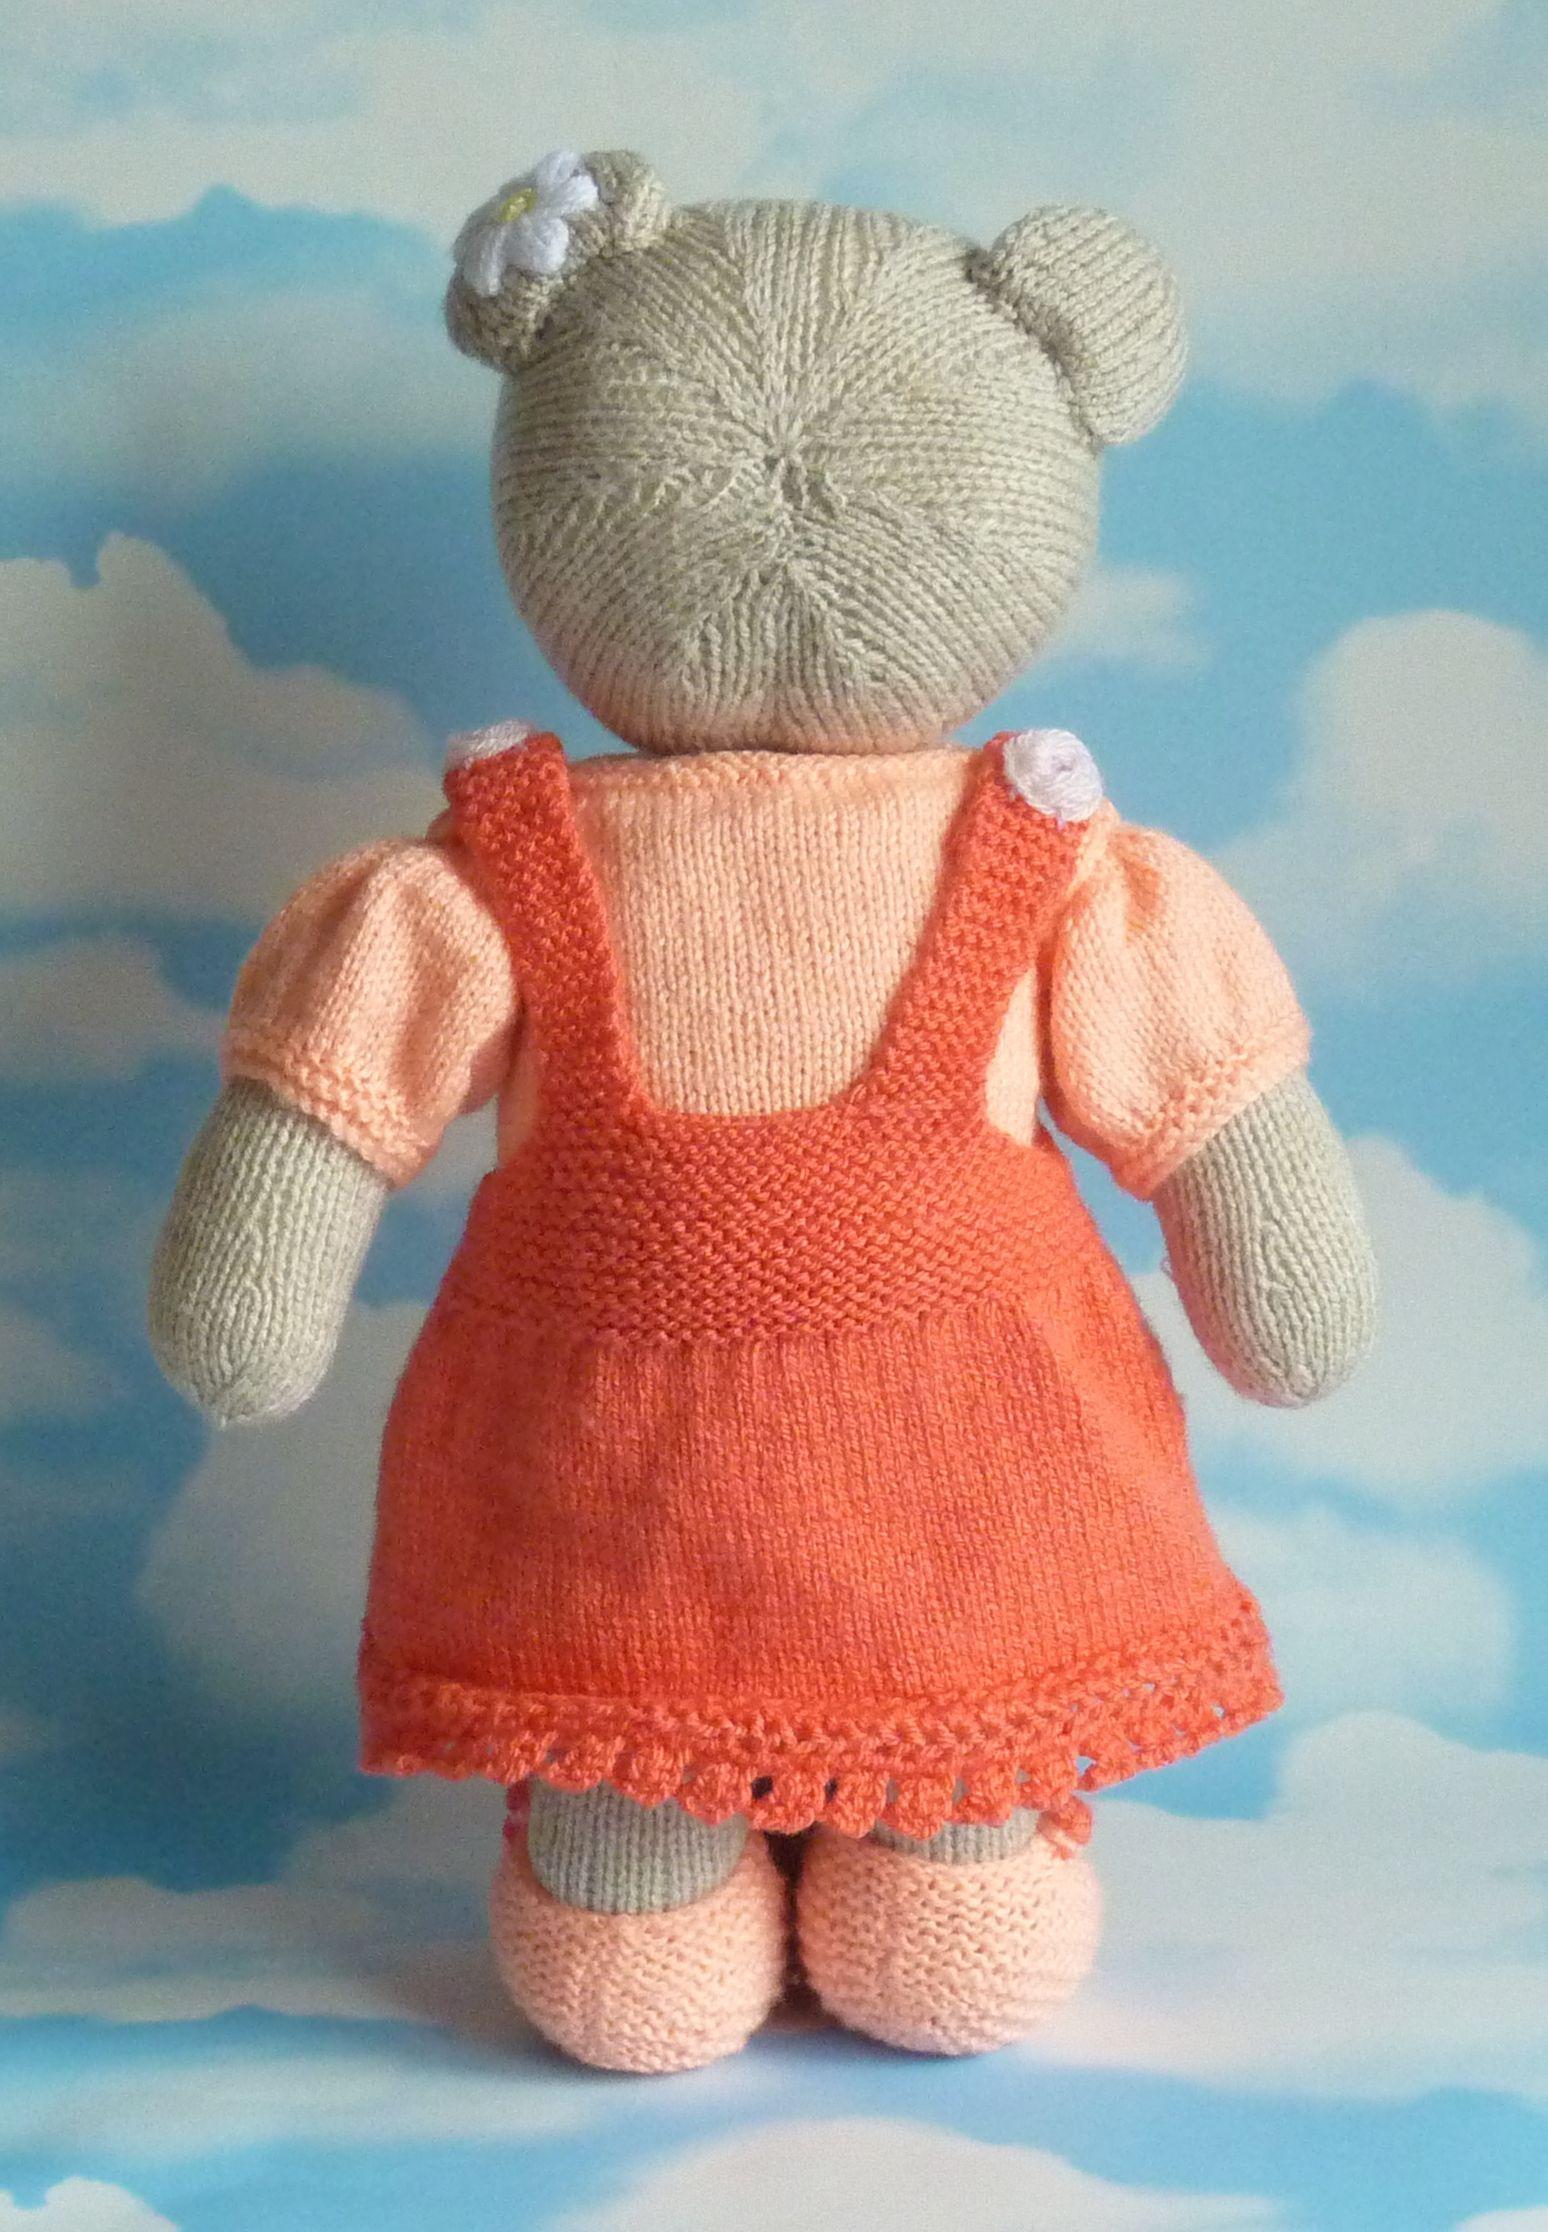 handmade gift birthday teddy_bear